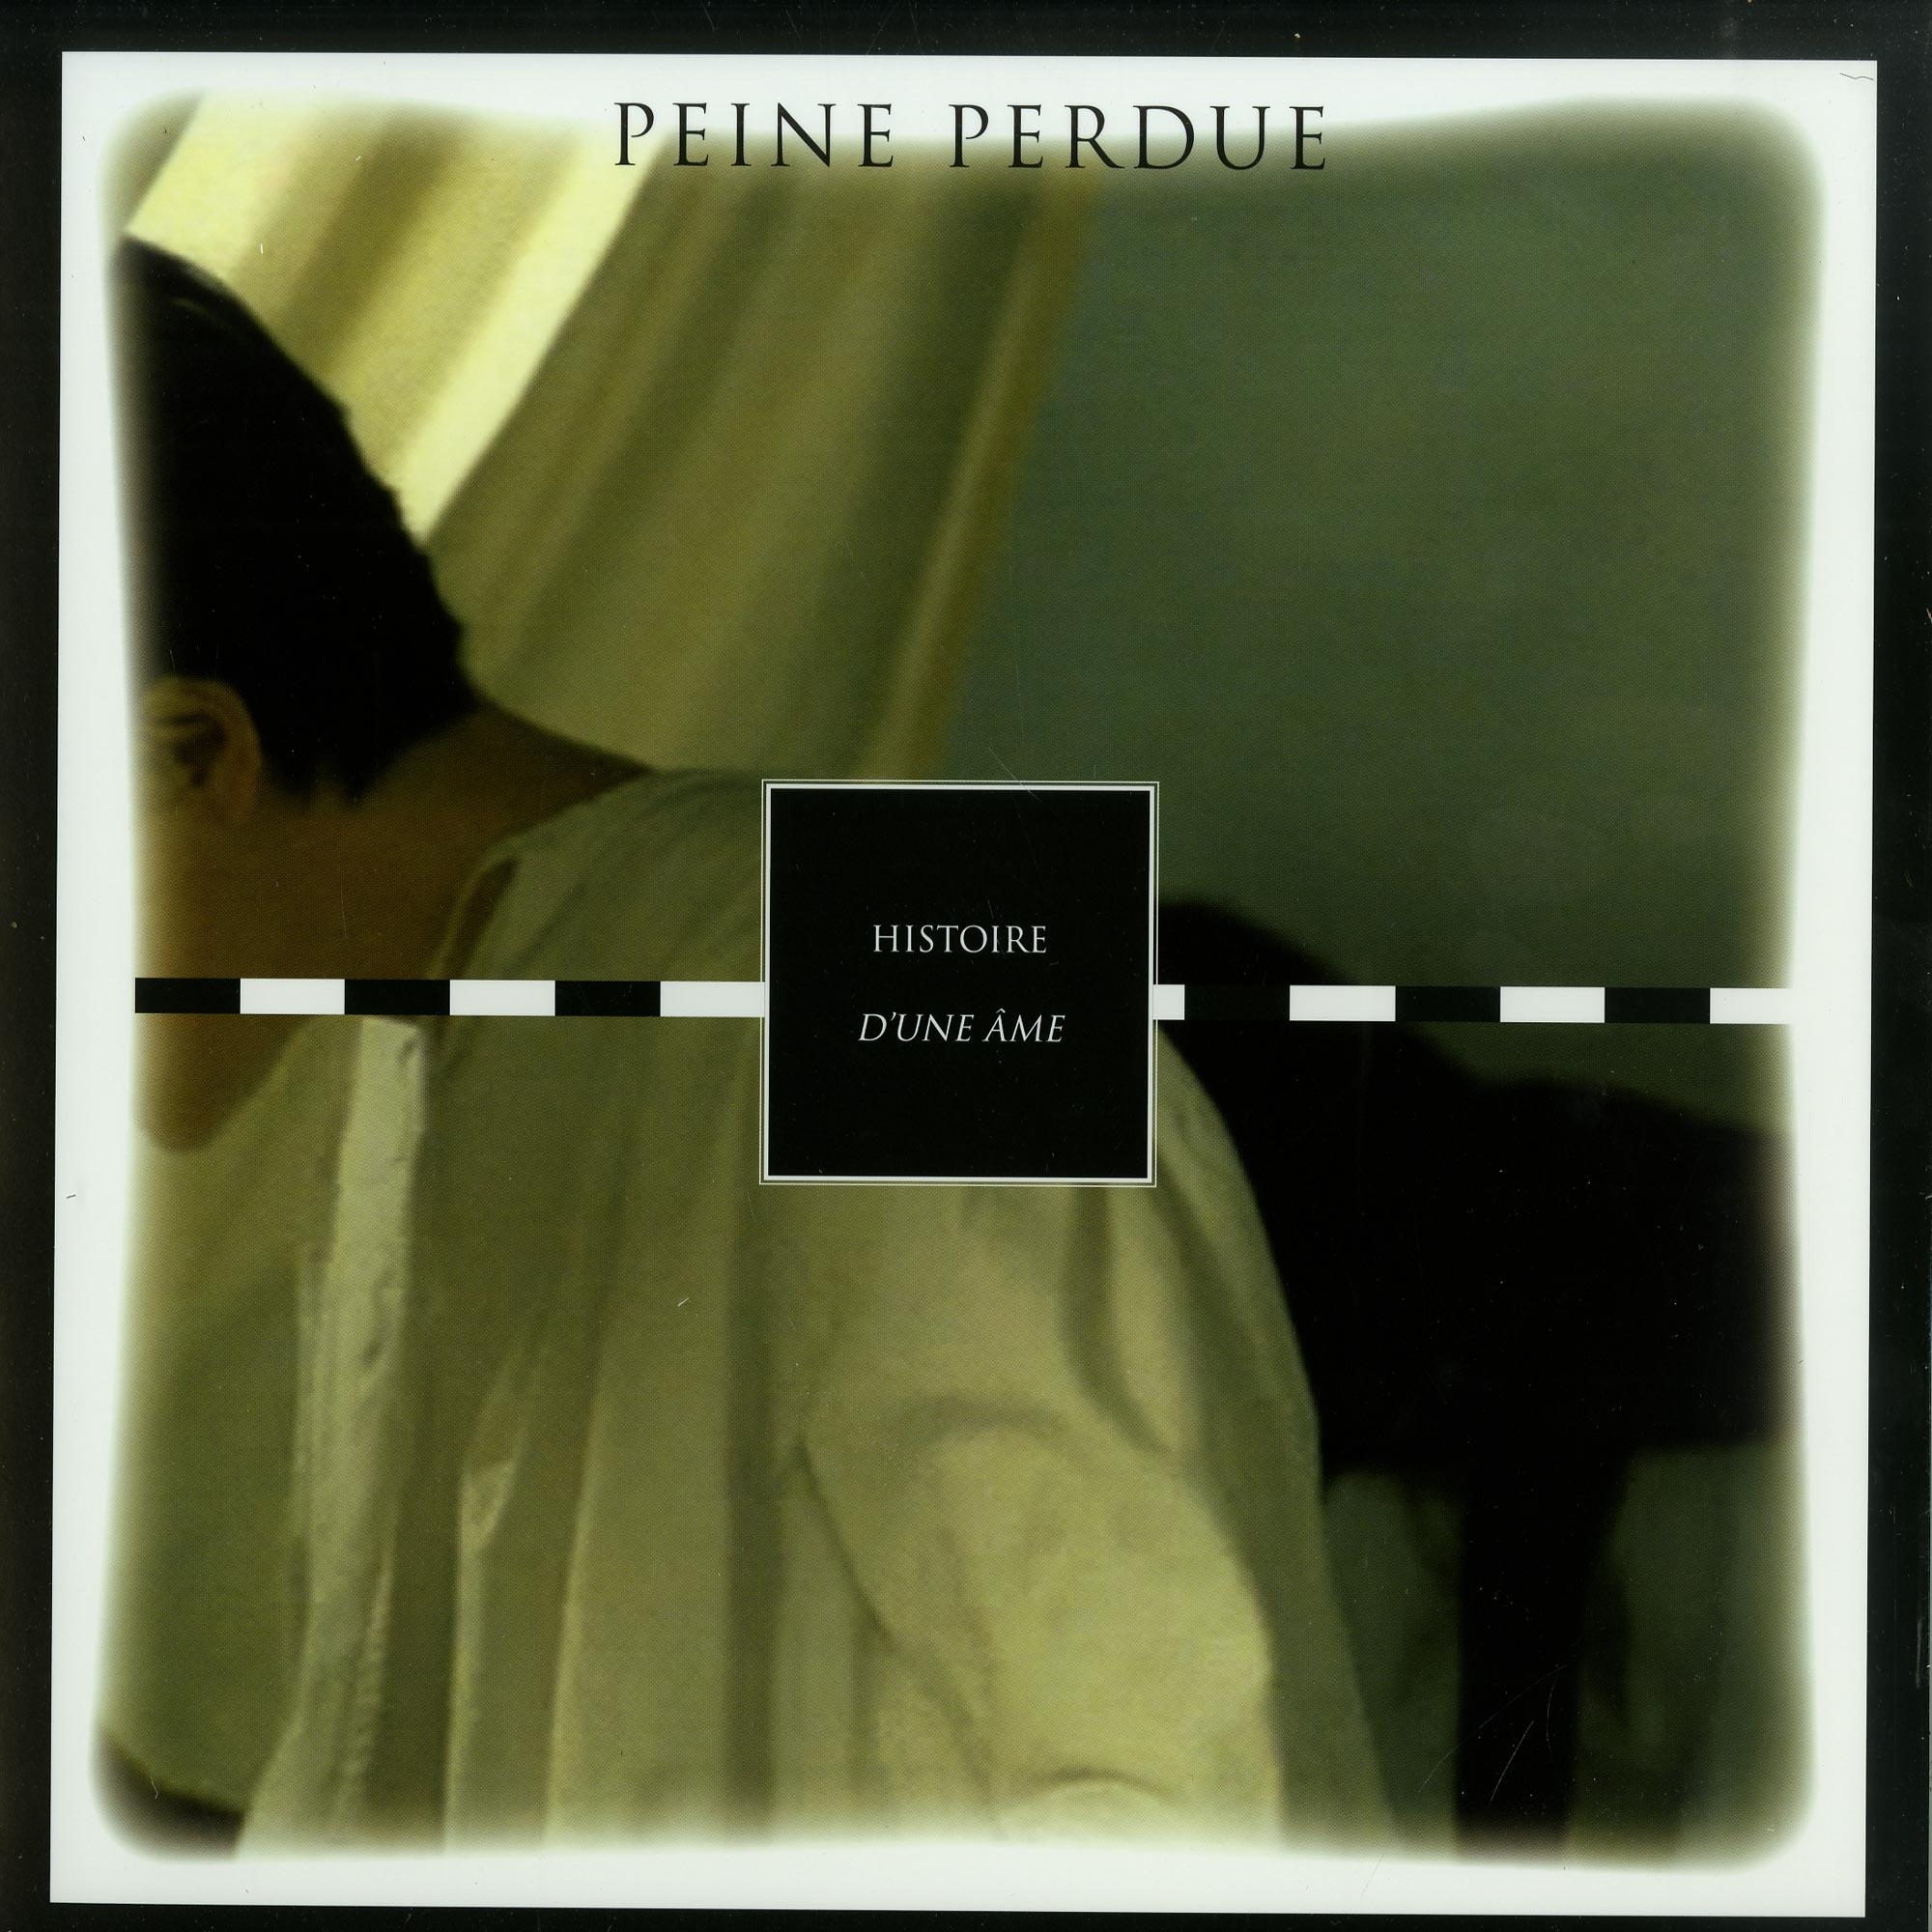 Peine Perdue - HISTOIRE DUNE AME